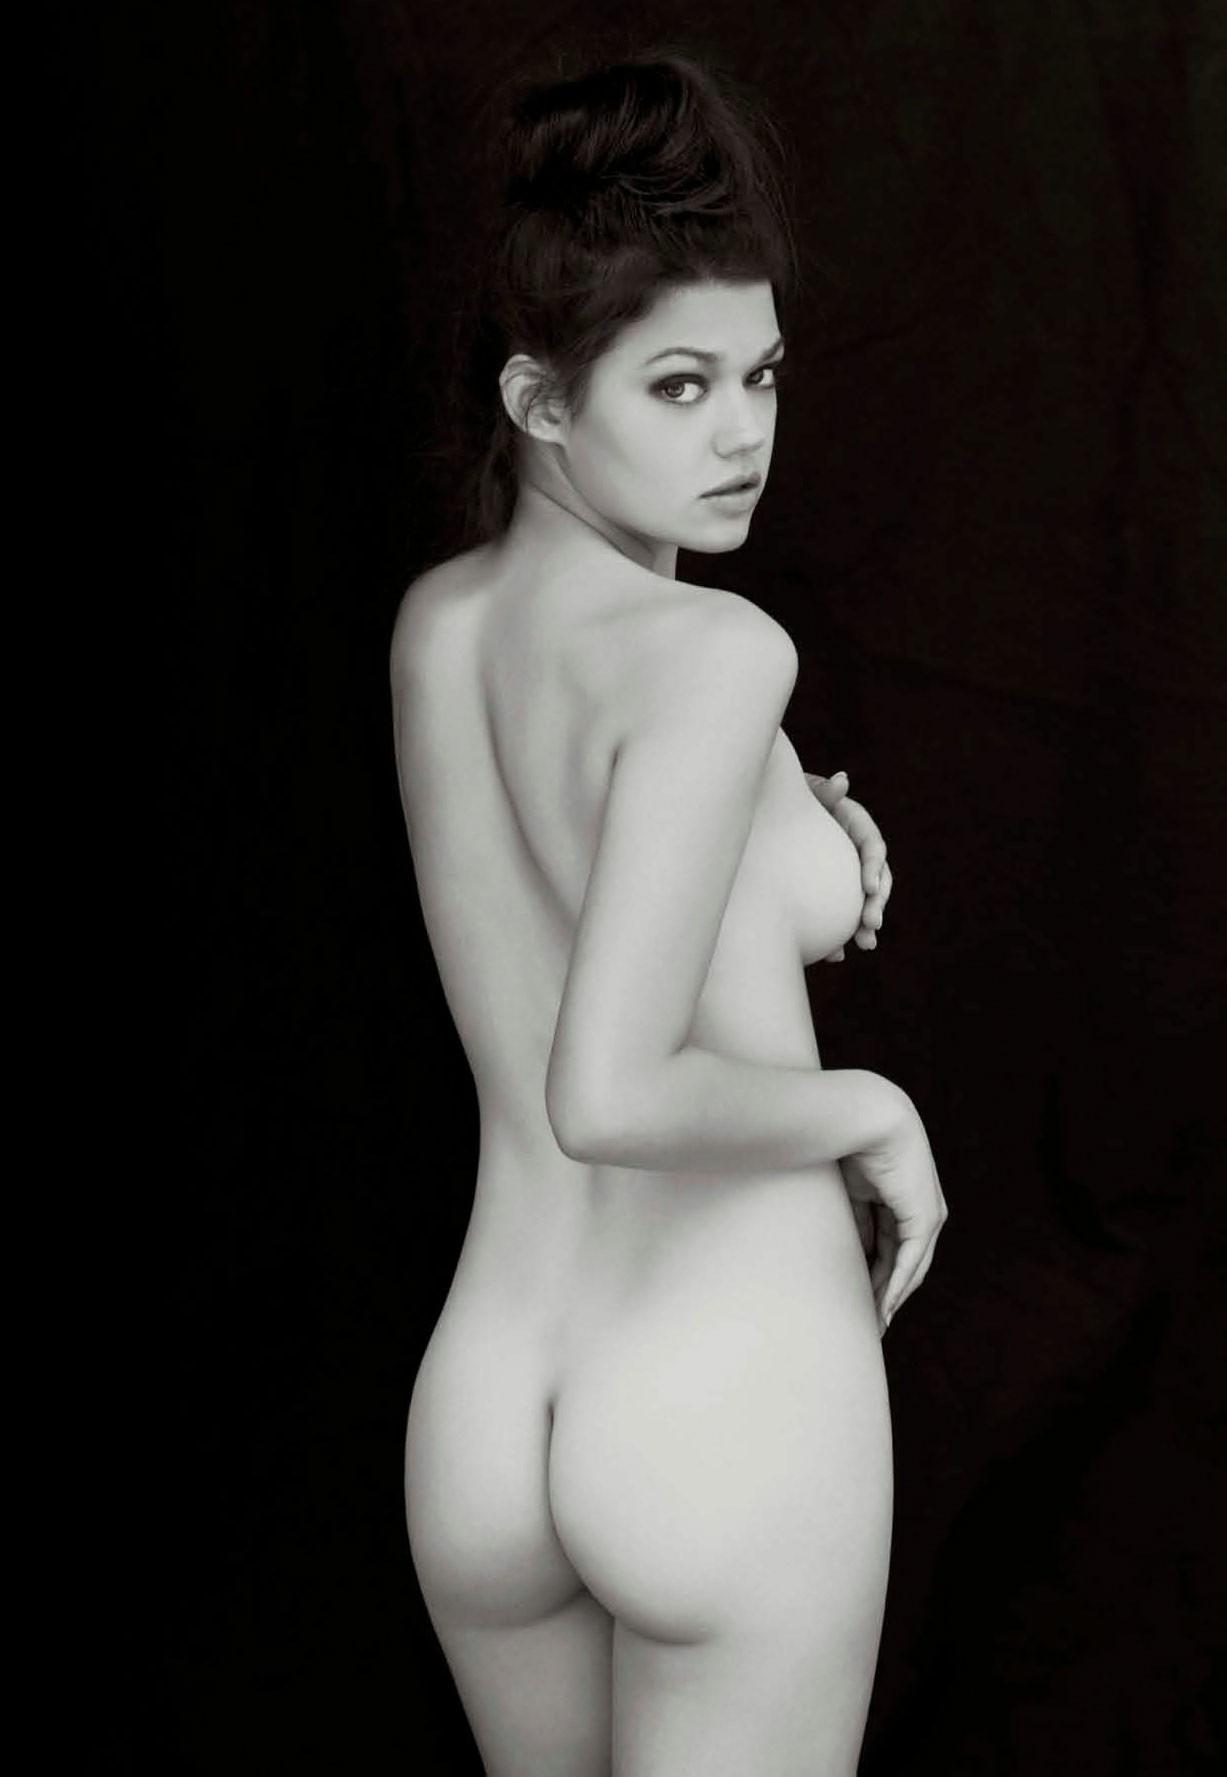 Eye of Wisdom / Jascha Fehrle nude by David Lipman - Maxim US september 2017